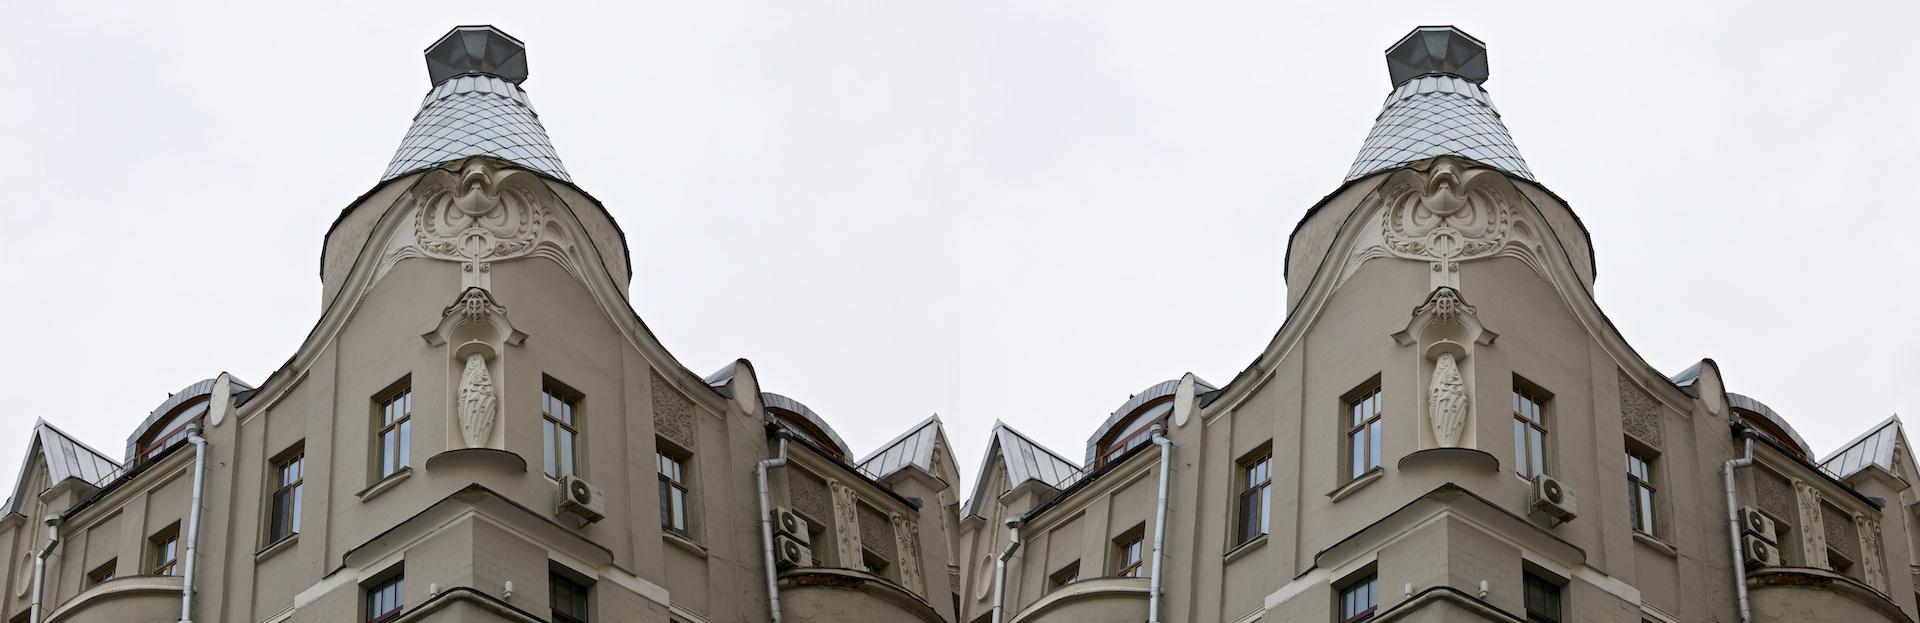 2011 Москва стерео 3Д, район Кропоткинской, Moscow stereo 3D